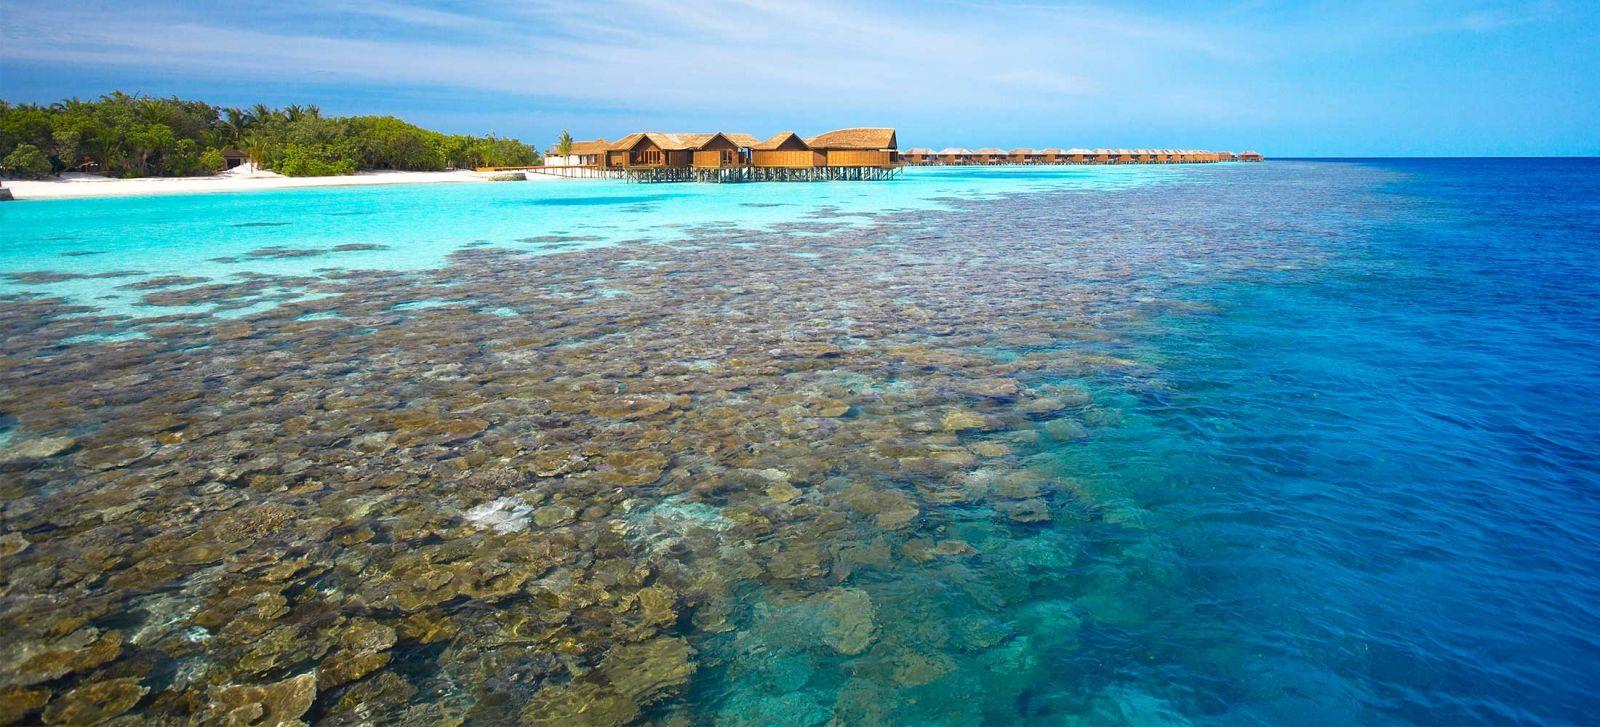 lặn biển Maldives